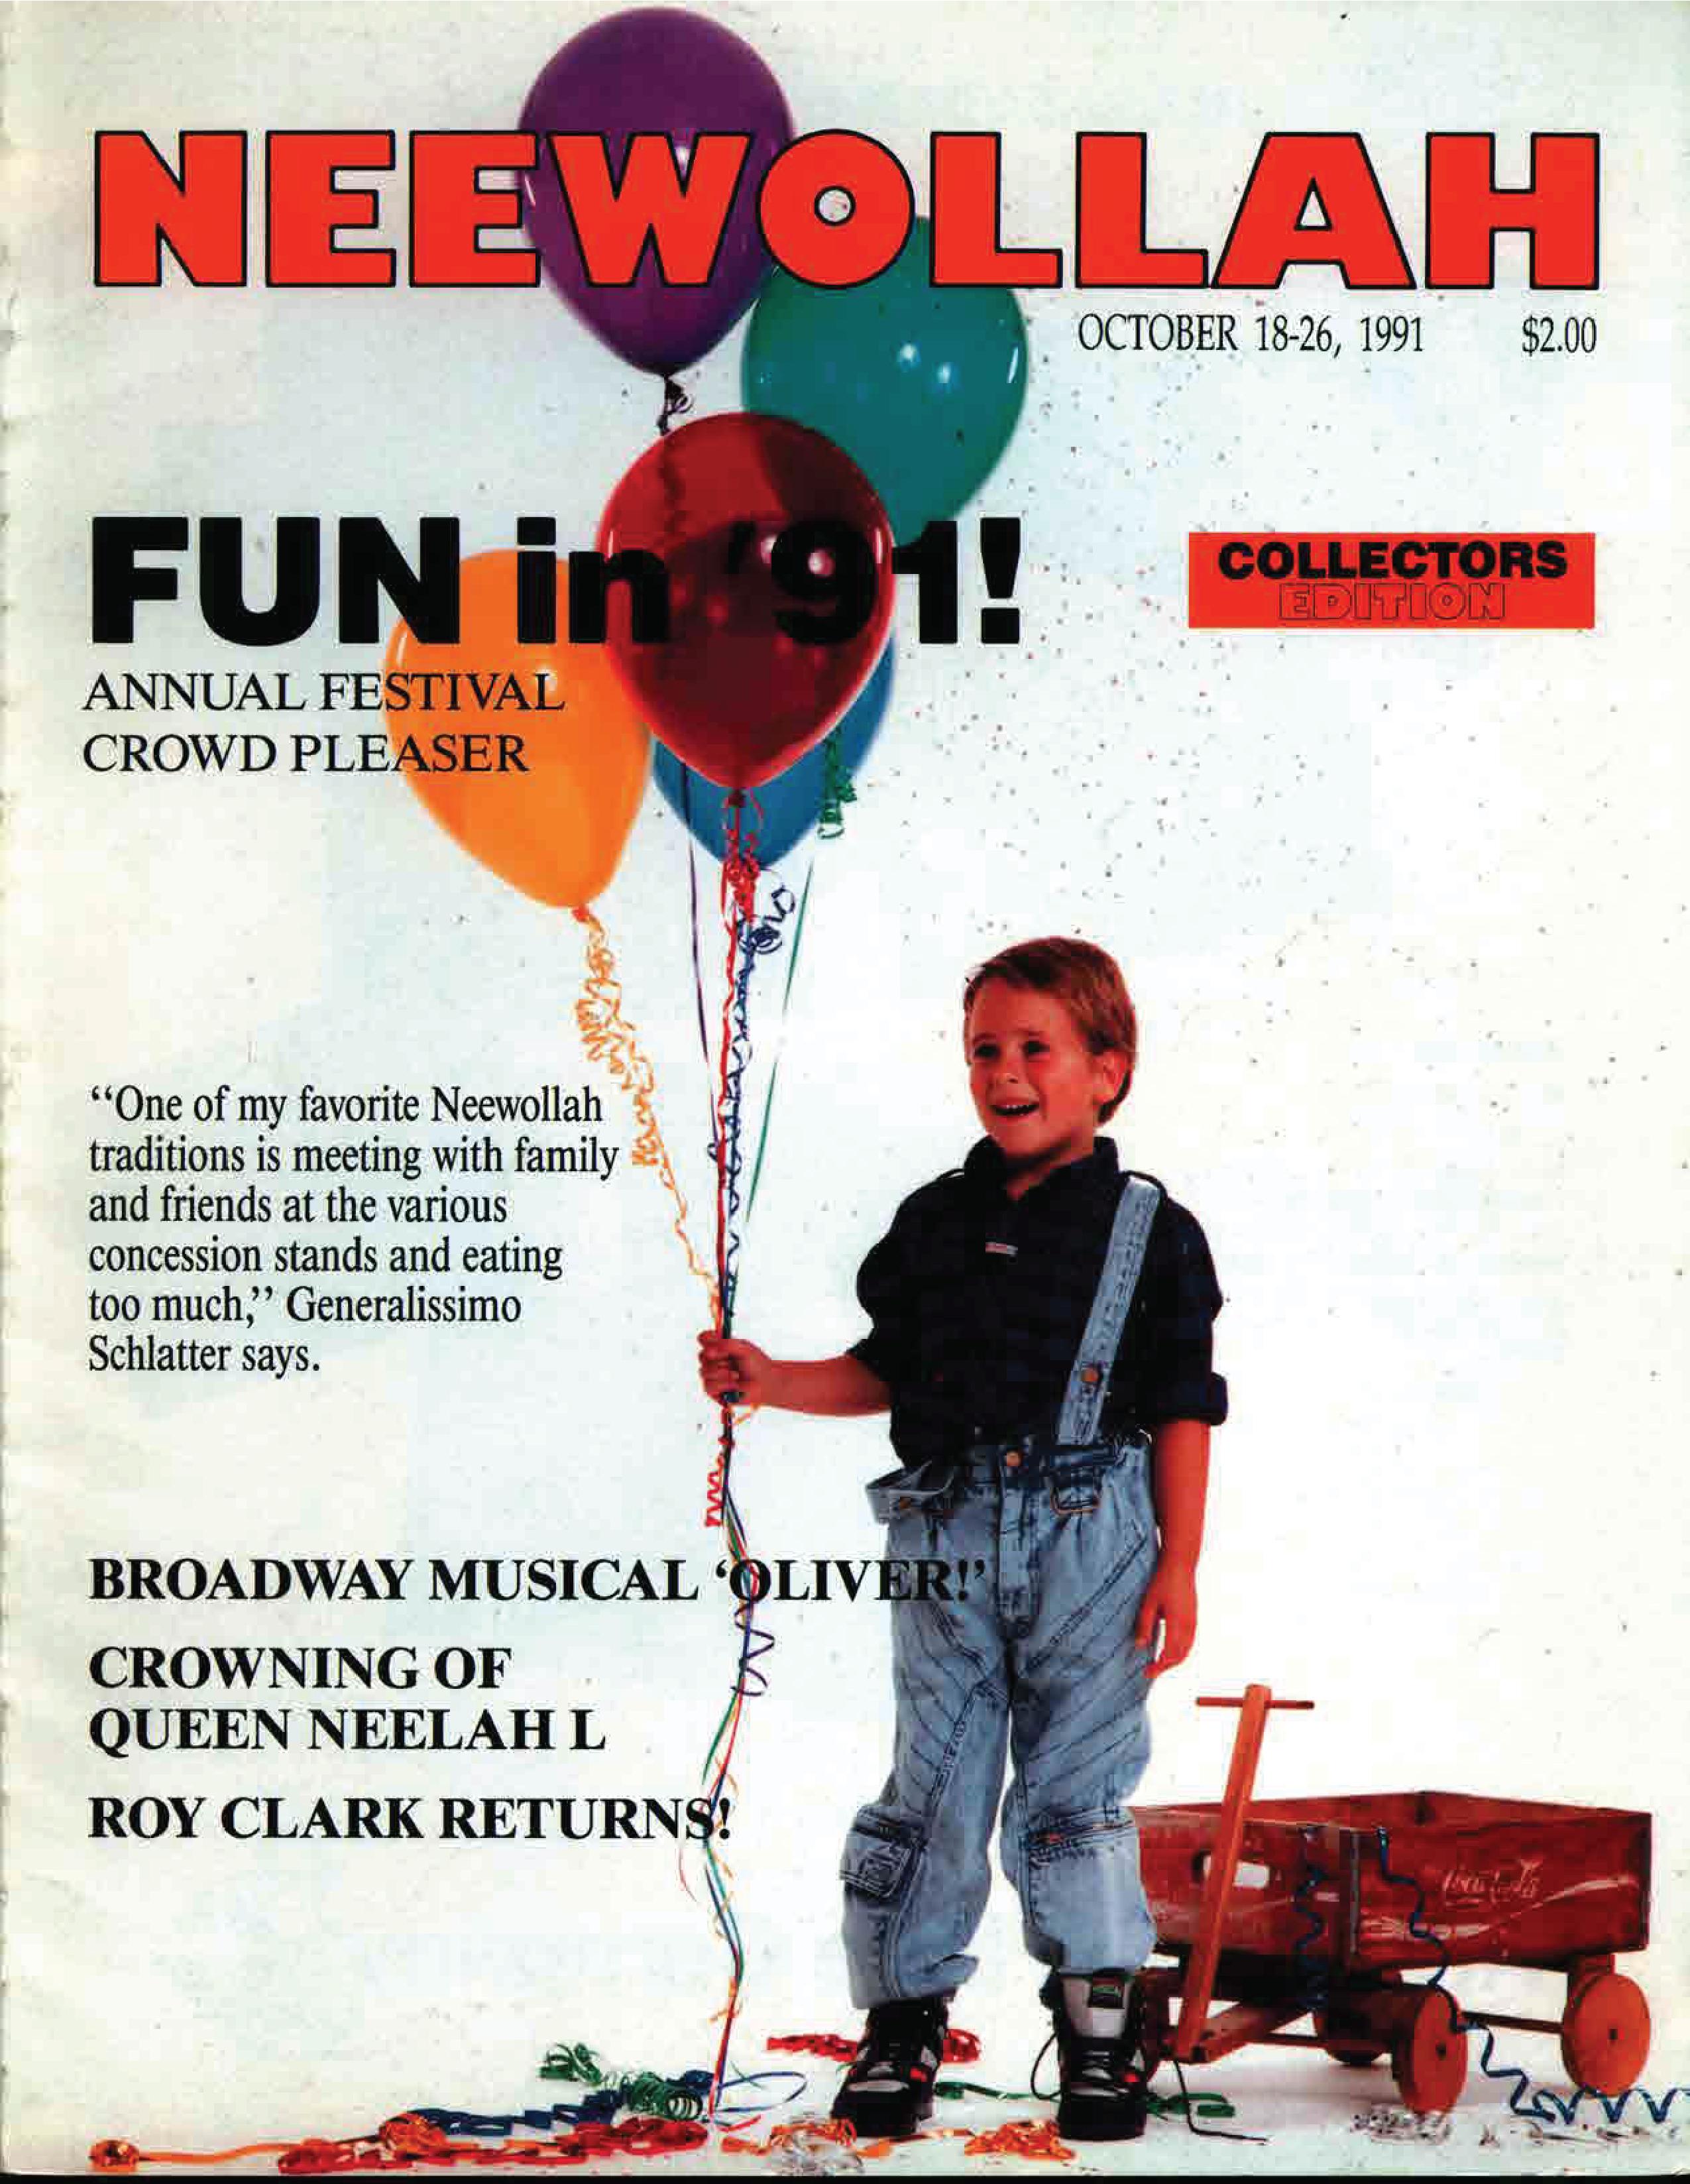 Neewollah 1991 Funin 91